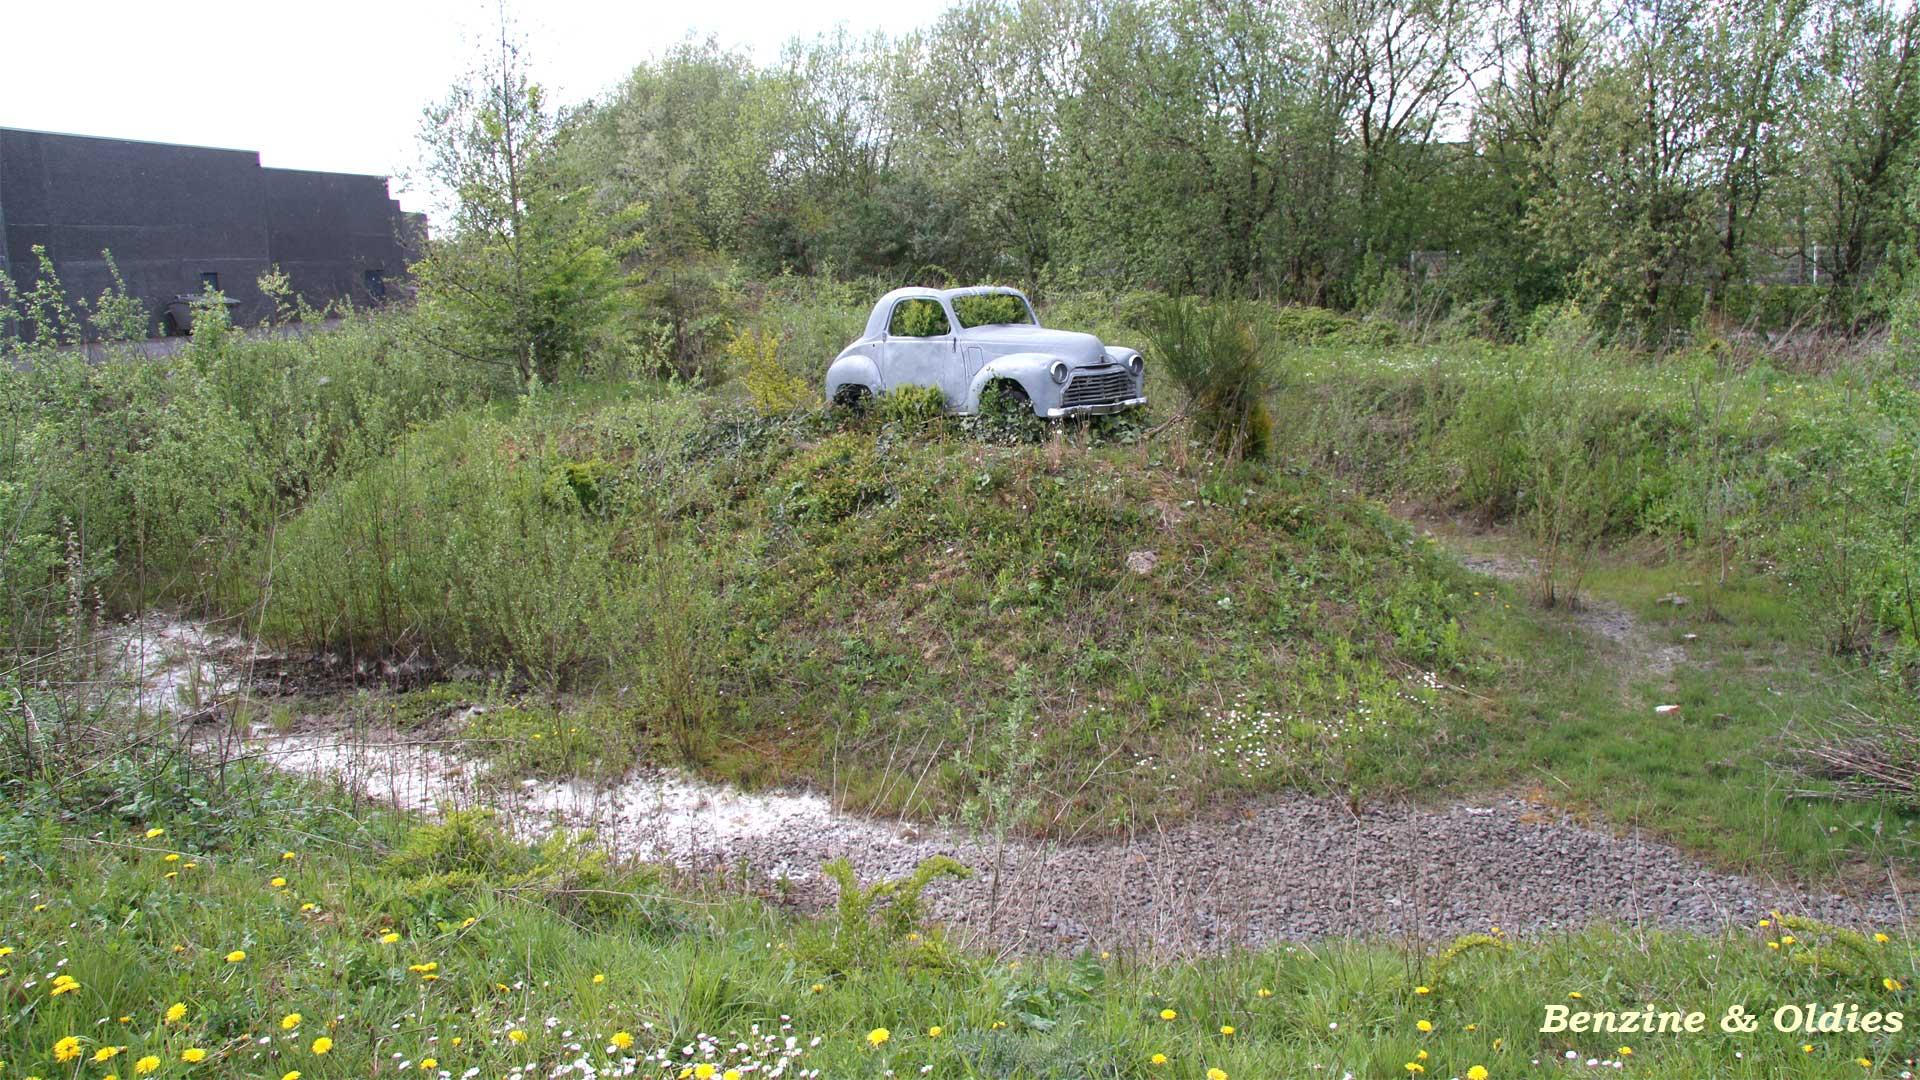 une Simca 6 carrosserie aluminium oubliée dans la nature - Simca6 782813simca6street03w19201080